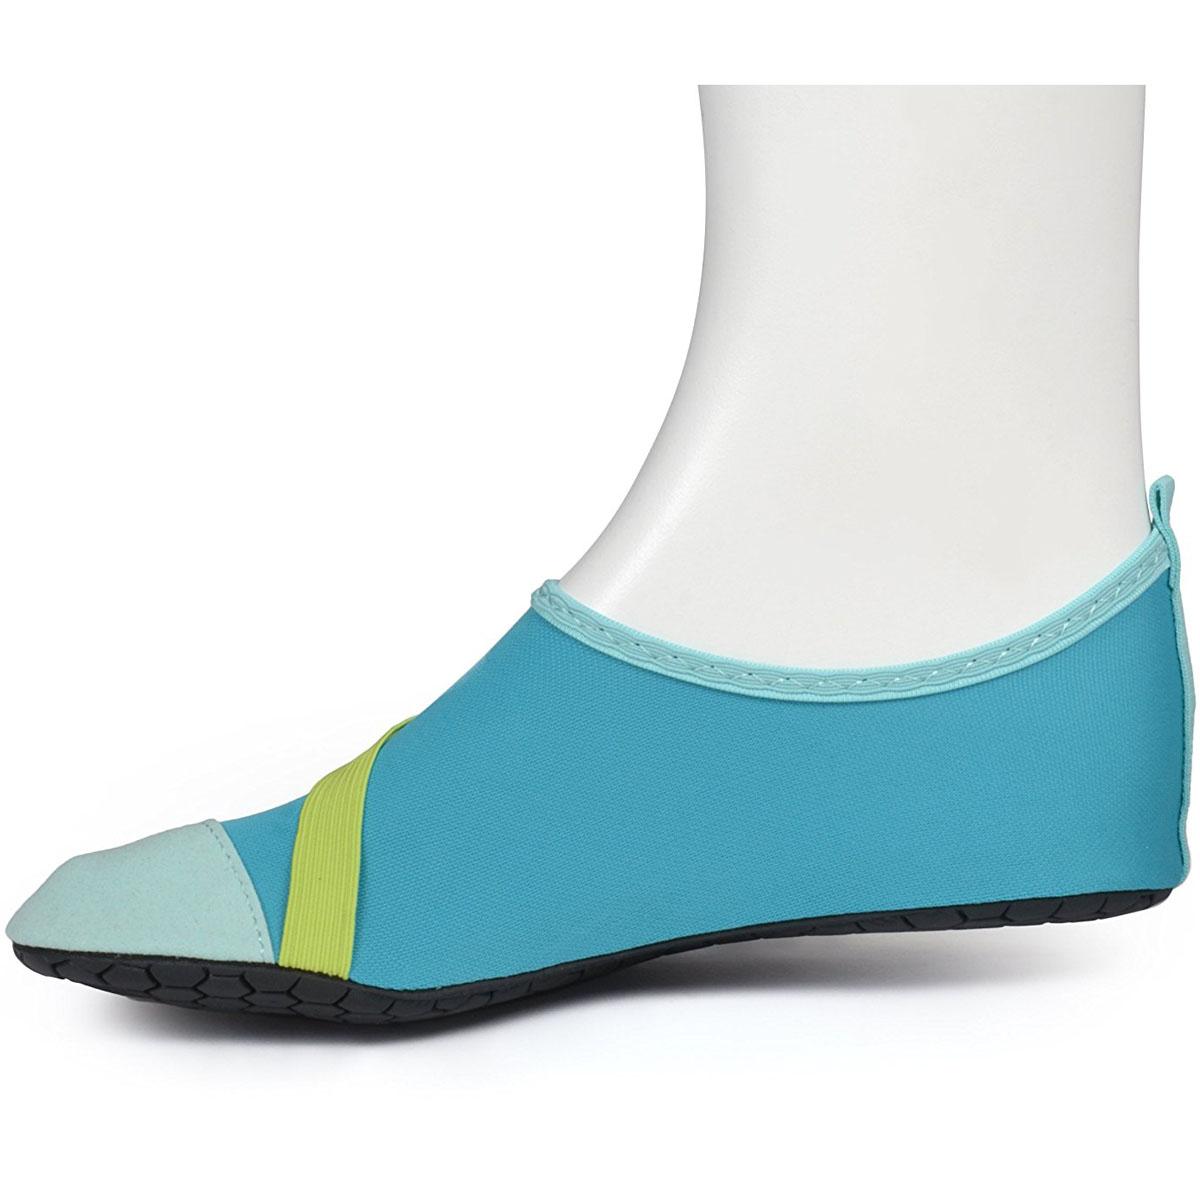 FitKicks-Women-039-s-Non-Slip-Sole-Active-Footwear thumbnail 36